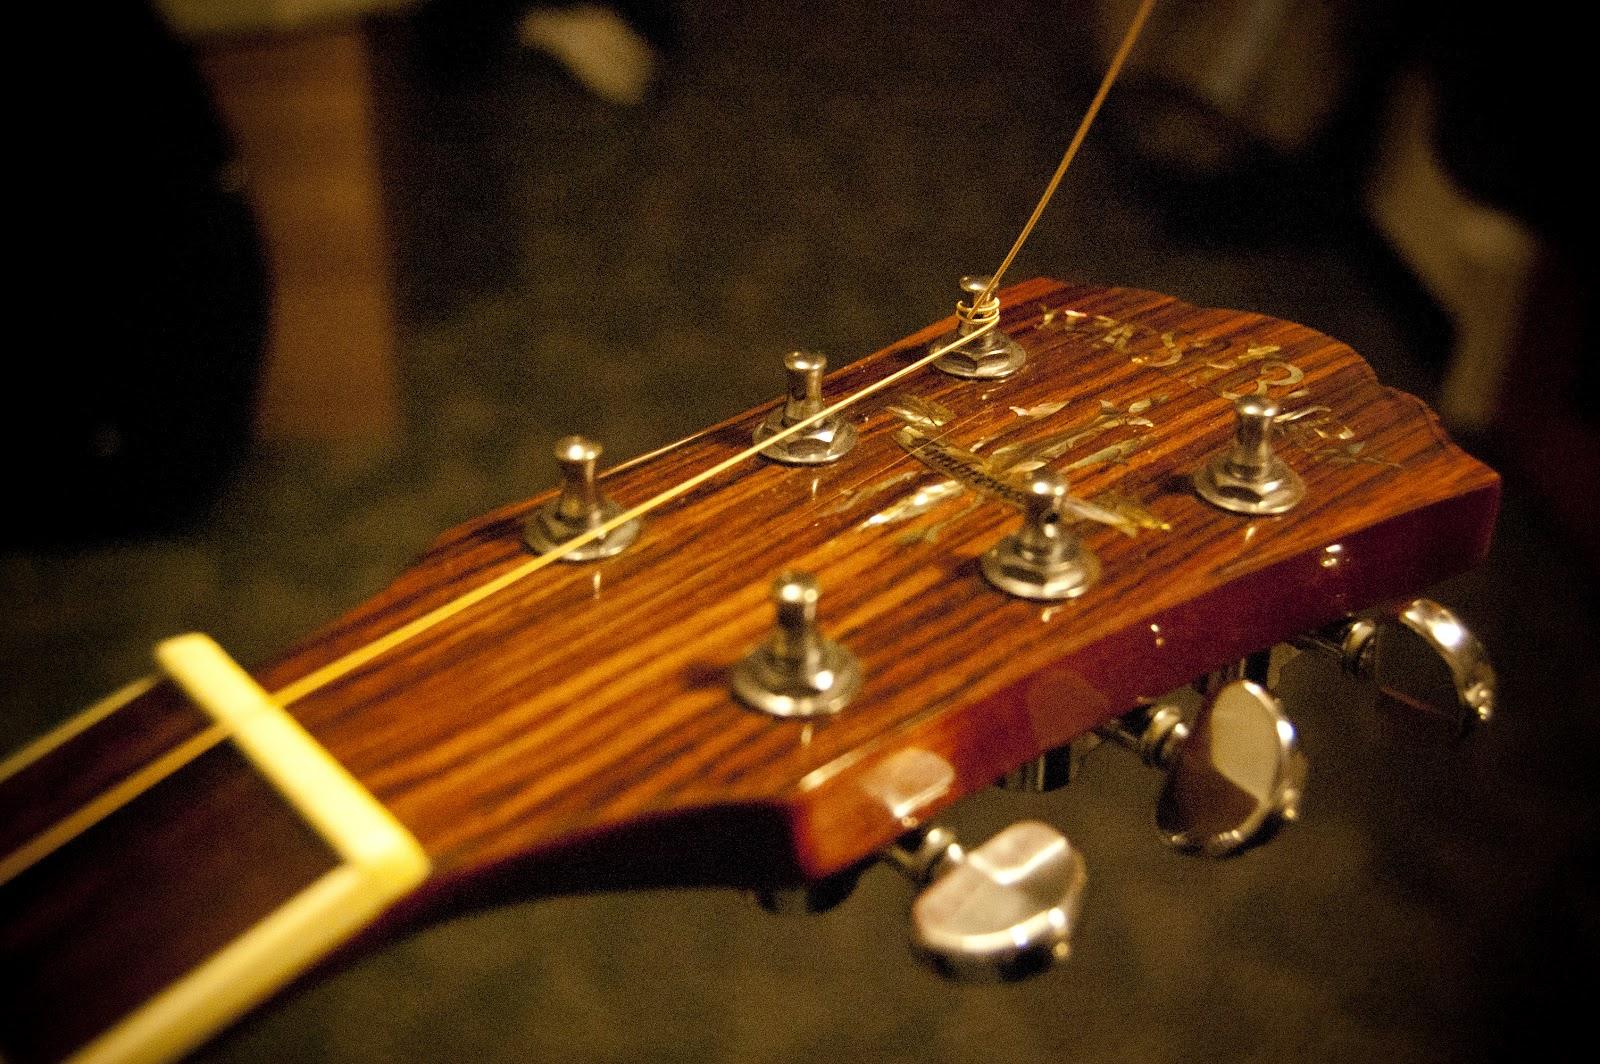 Restring Acoustic Guitar : guitart restring an acoustic guitar ~ Hamham.info Haus und Dekorationen